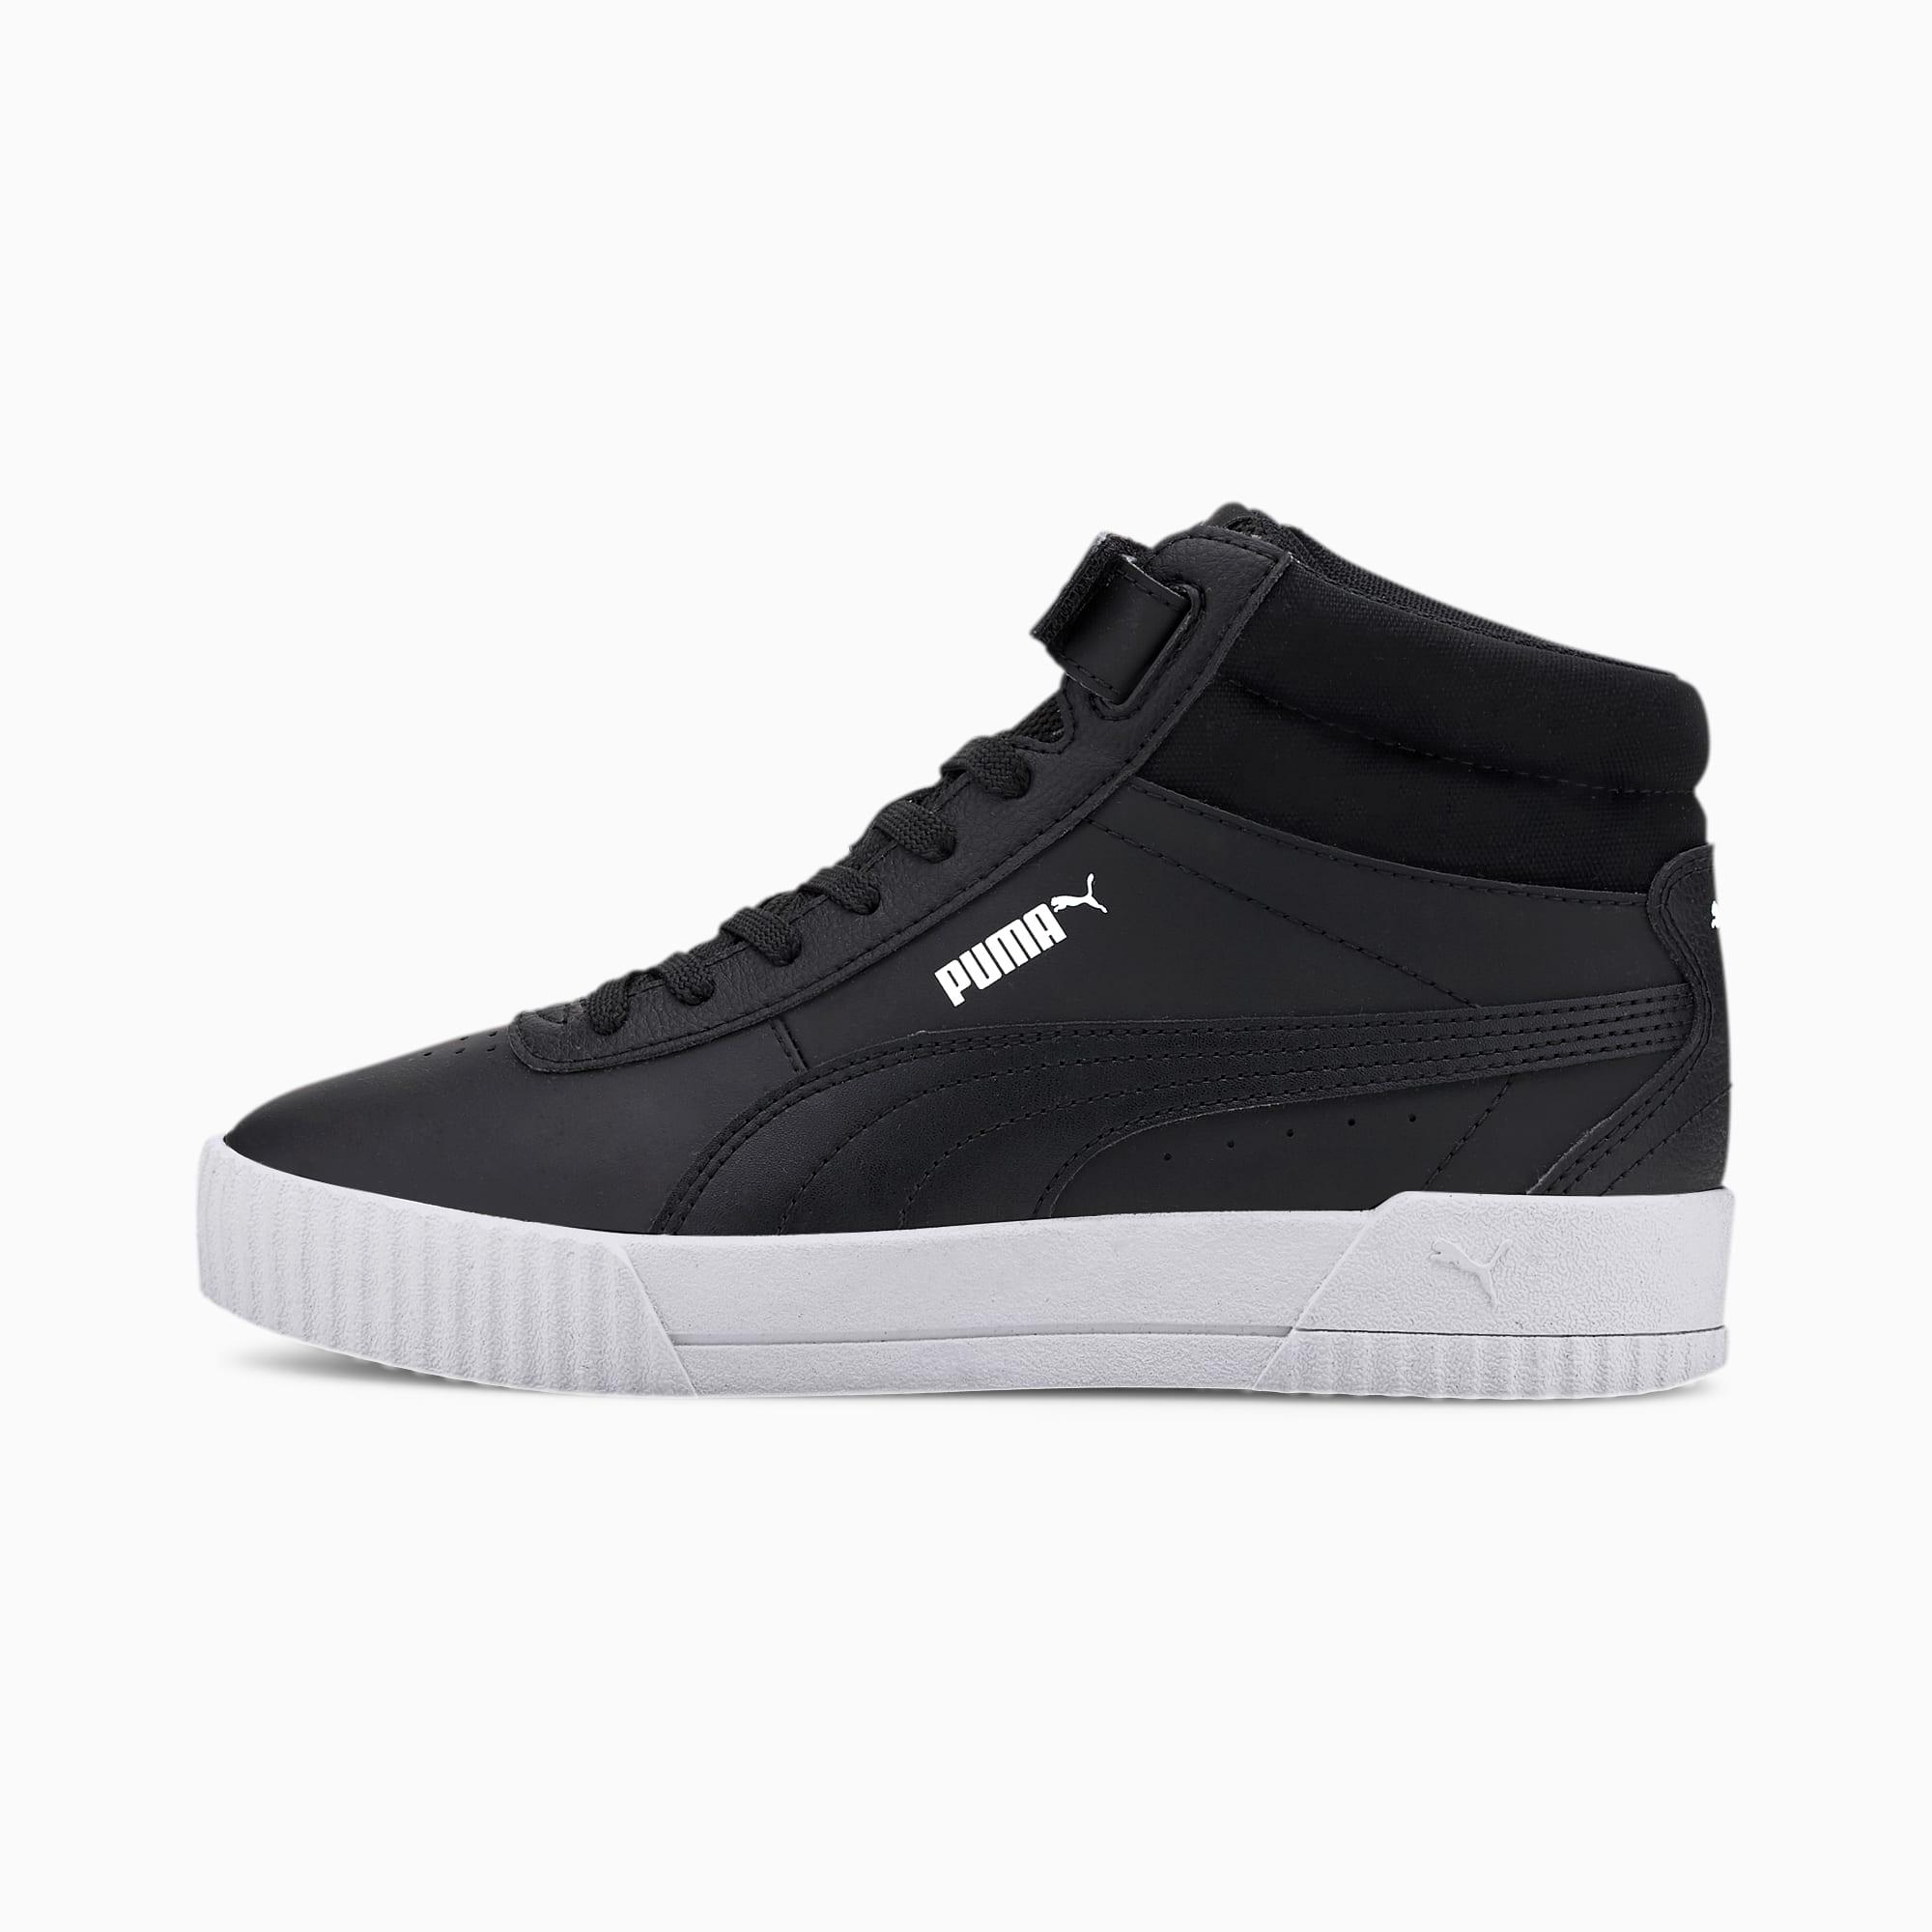 PUMA Chaussure Basket montante Carina femme, Noir, Taille 38, Chaussures